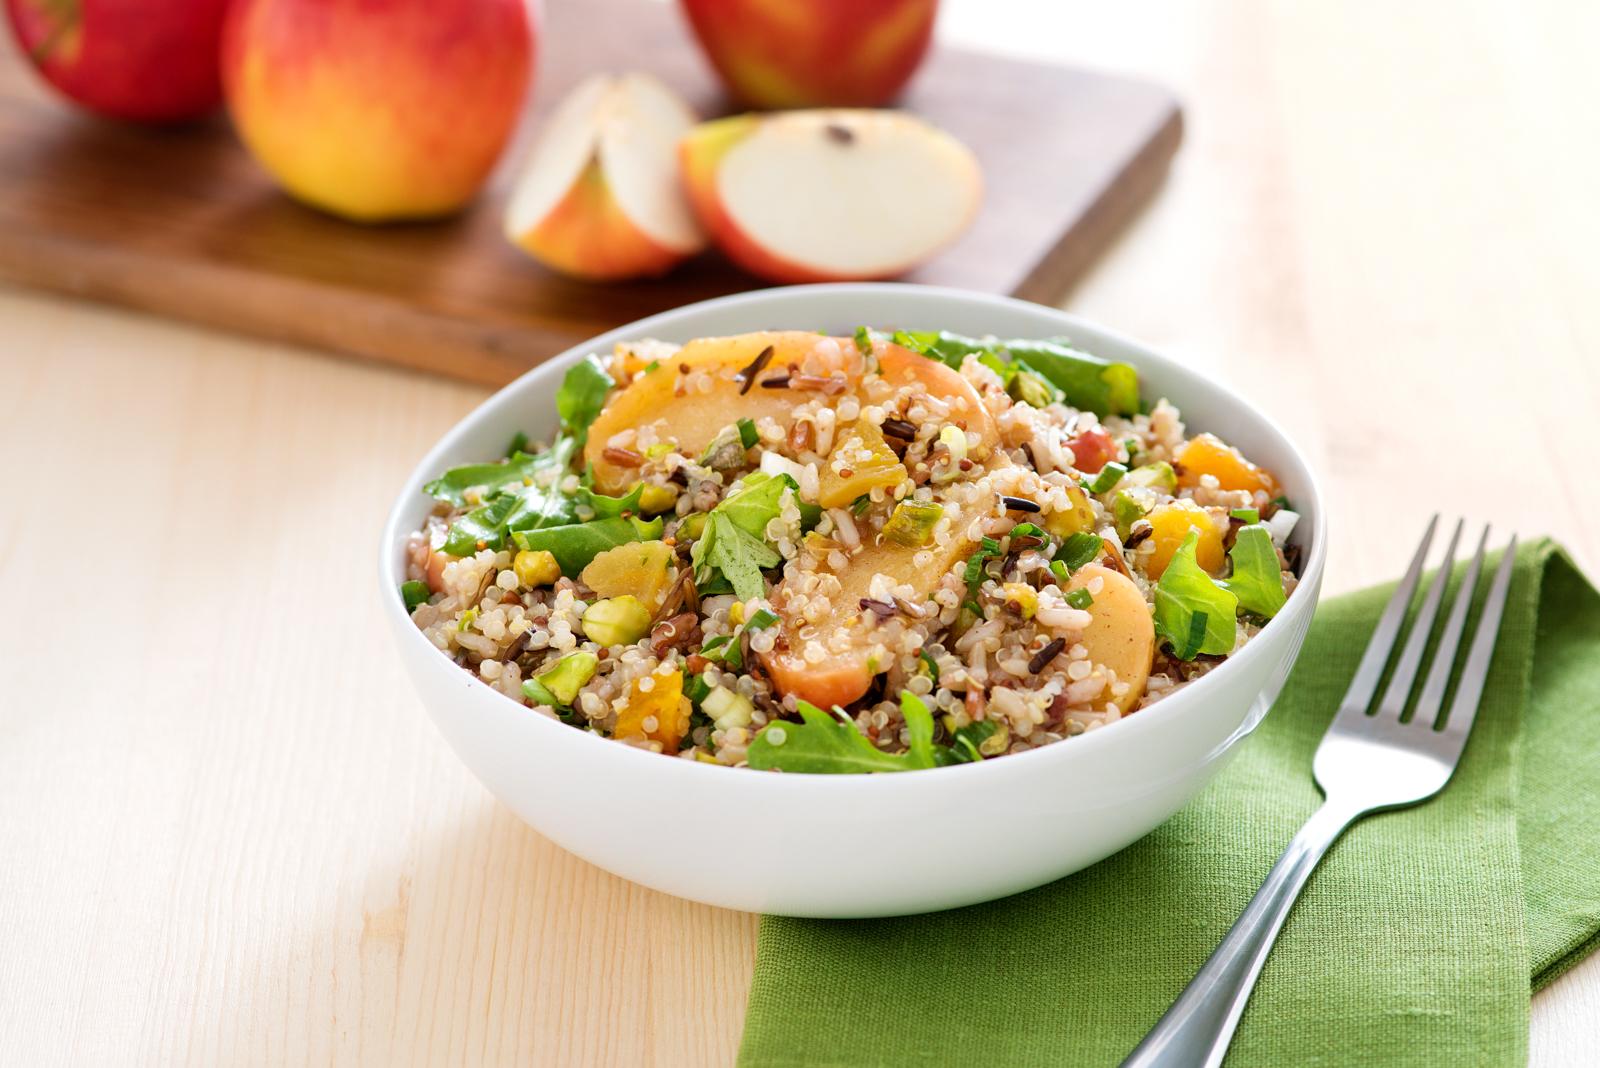 Roasted Apple, Quinoa & Wild Rice Salad - Produce Made Simple